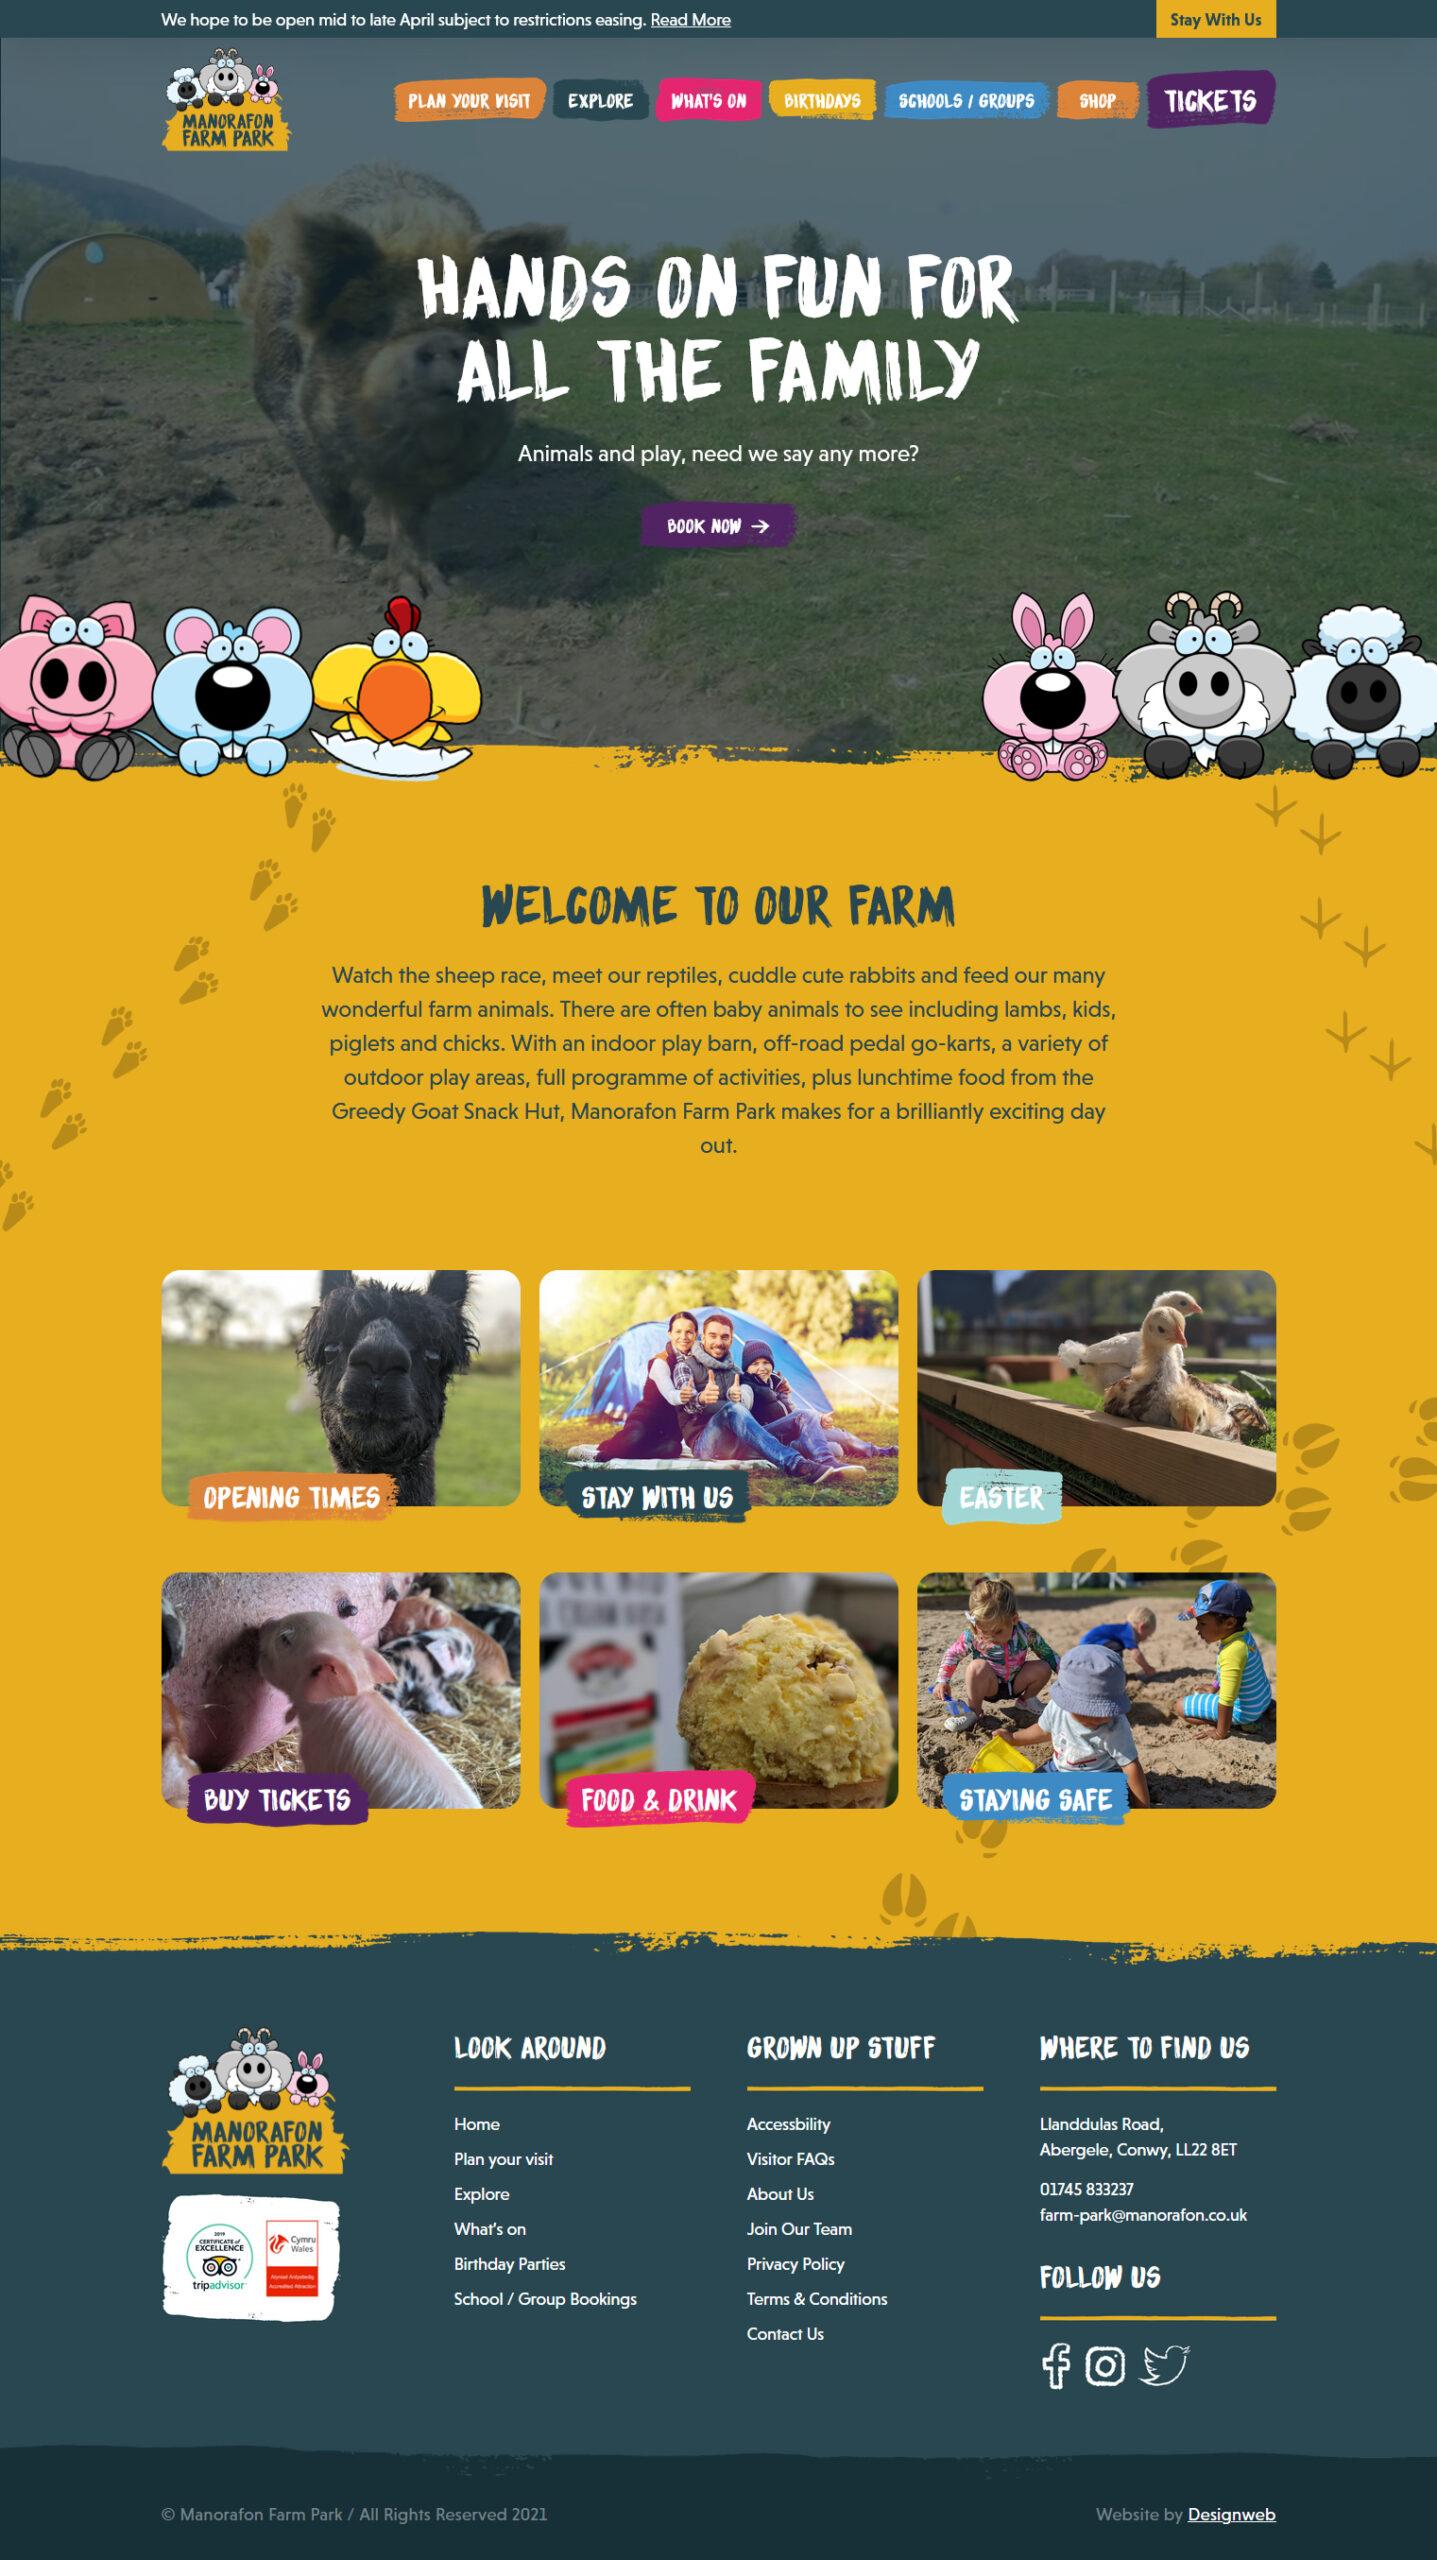 Manorafon Farm Park - Web Design Project by Designweb North Wales